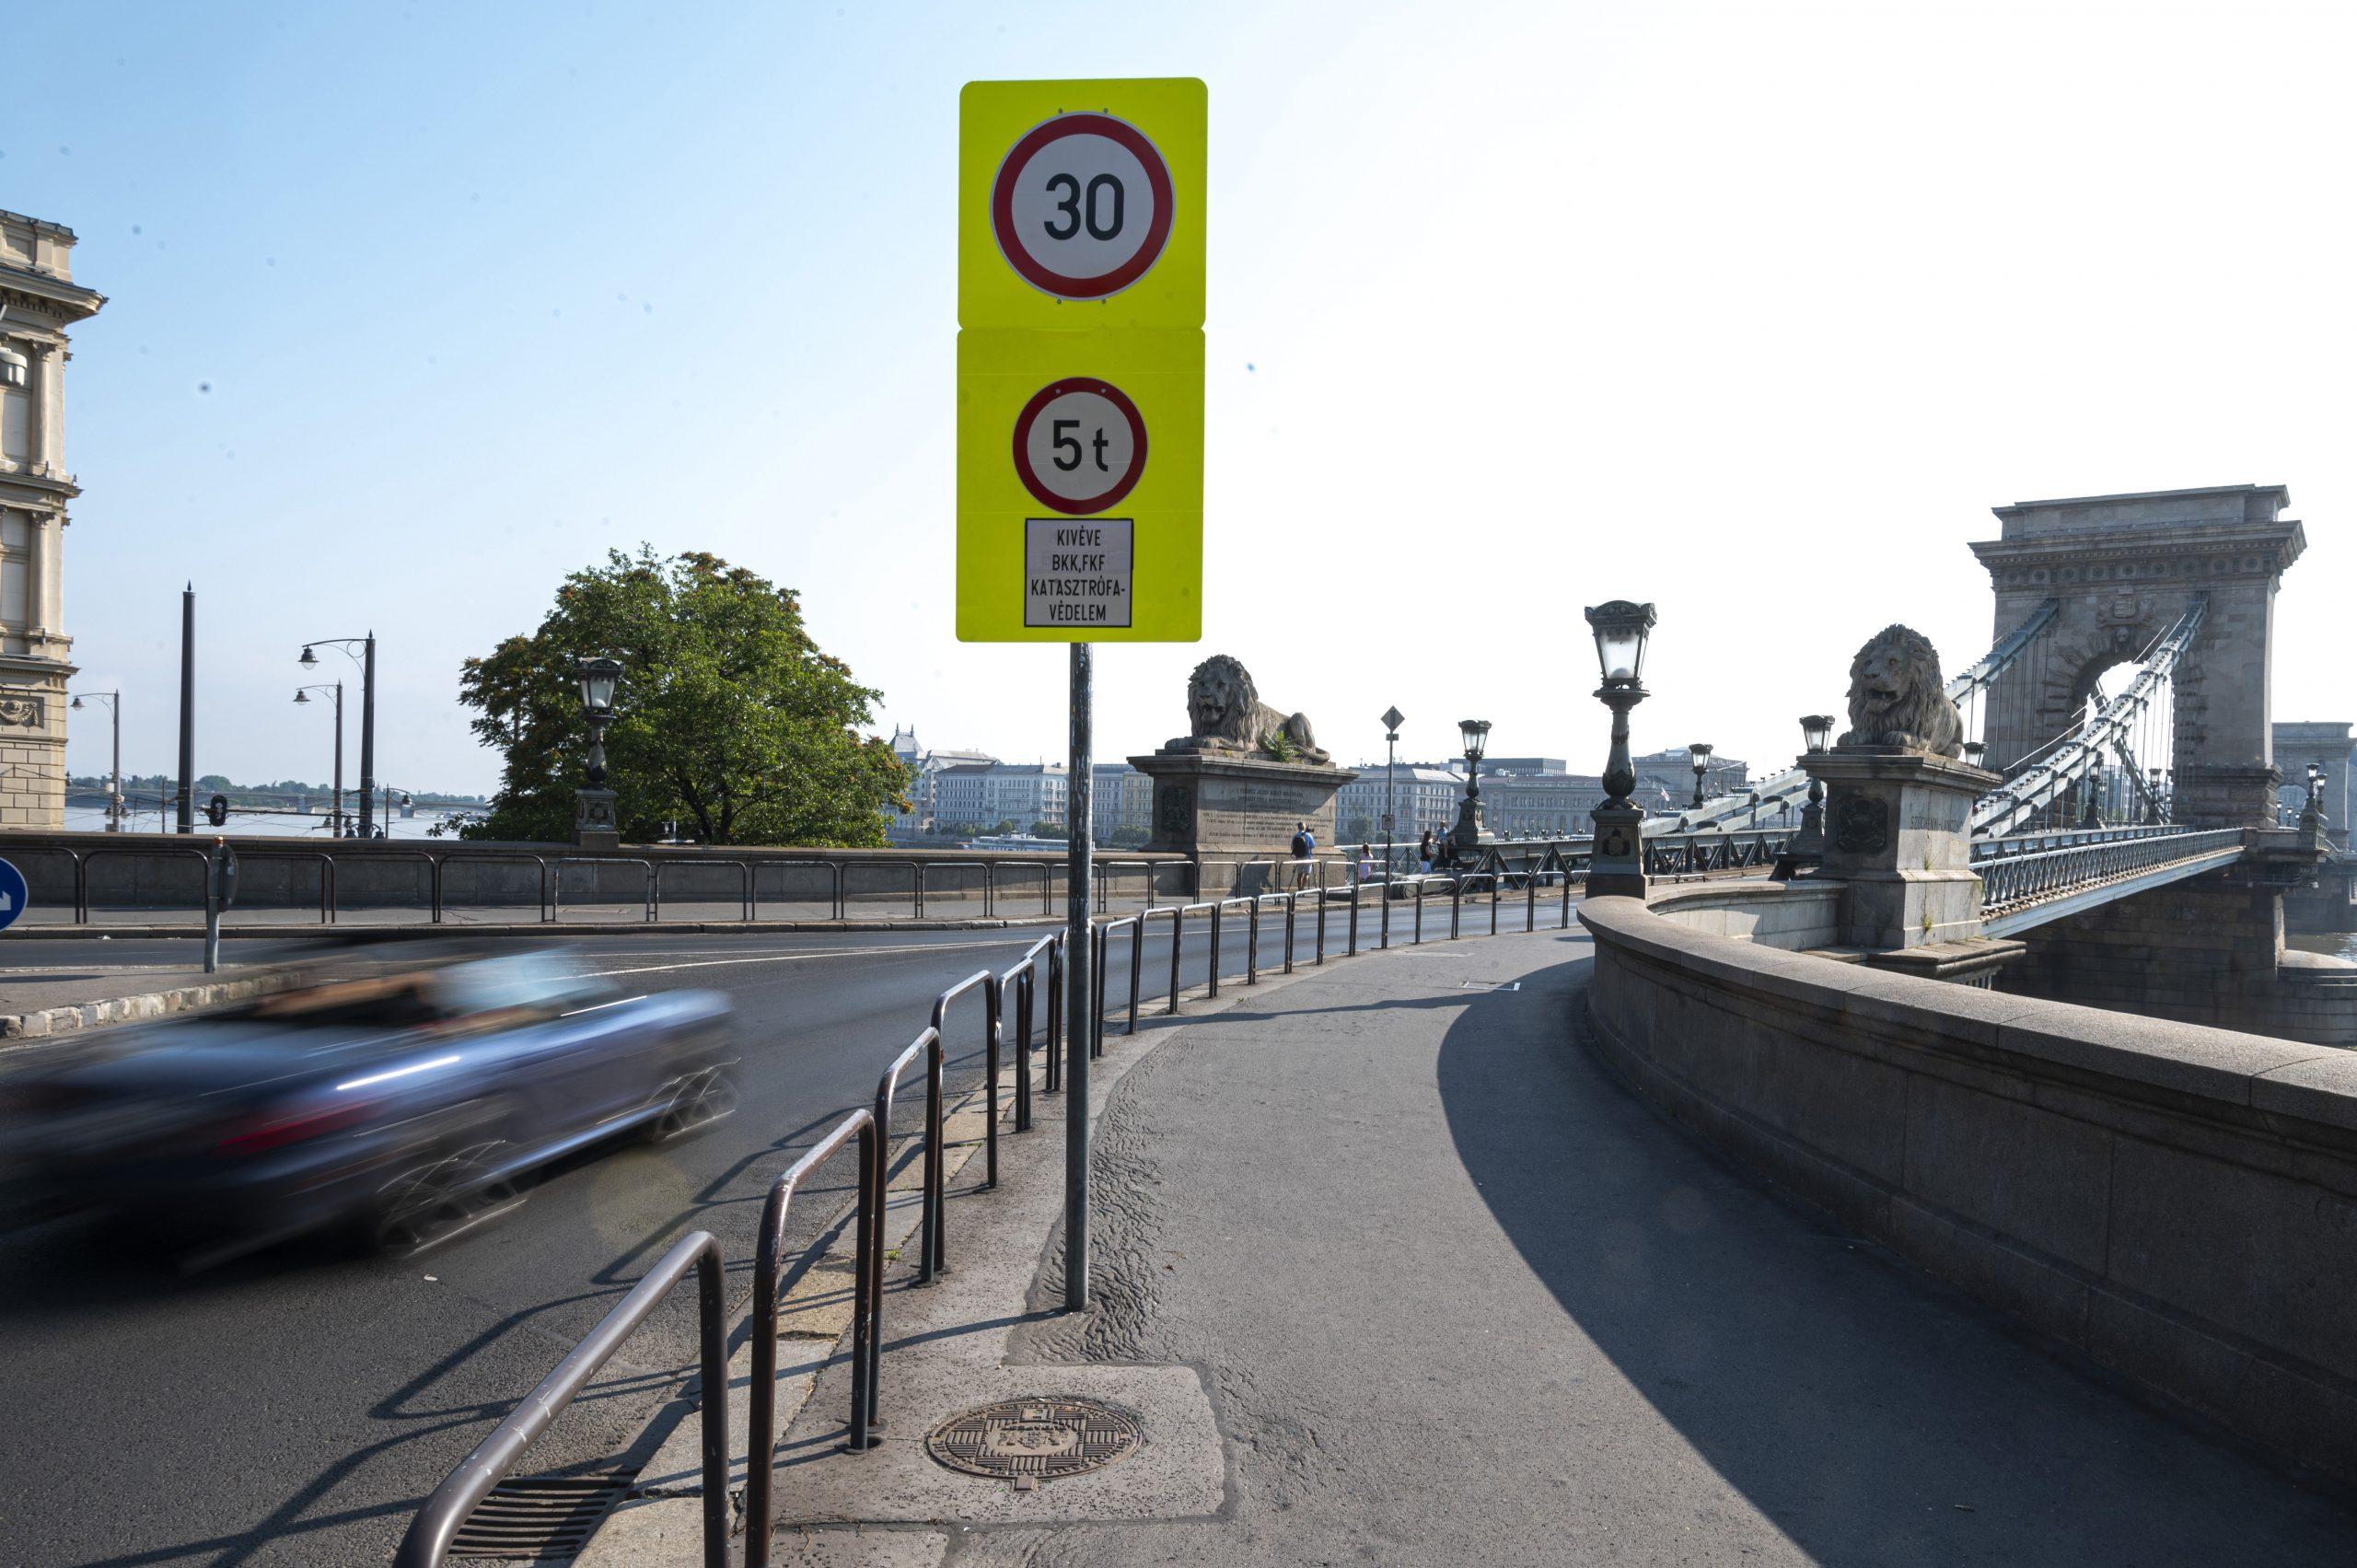 Fidesz Slams Municipal Council for Delays in Chain Bridge Revamp Decisions post's picture